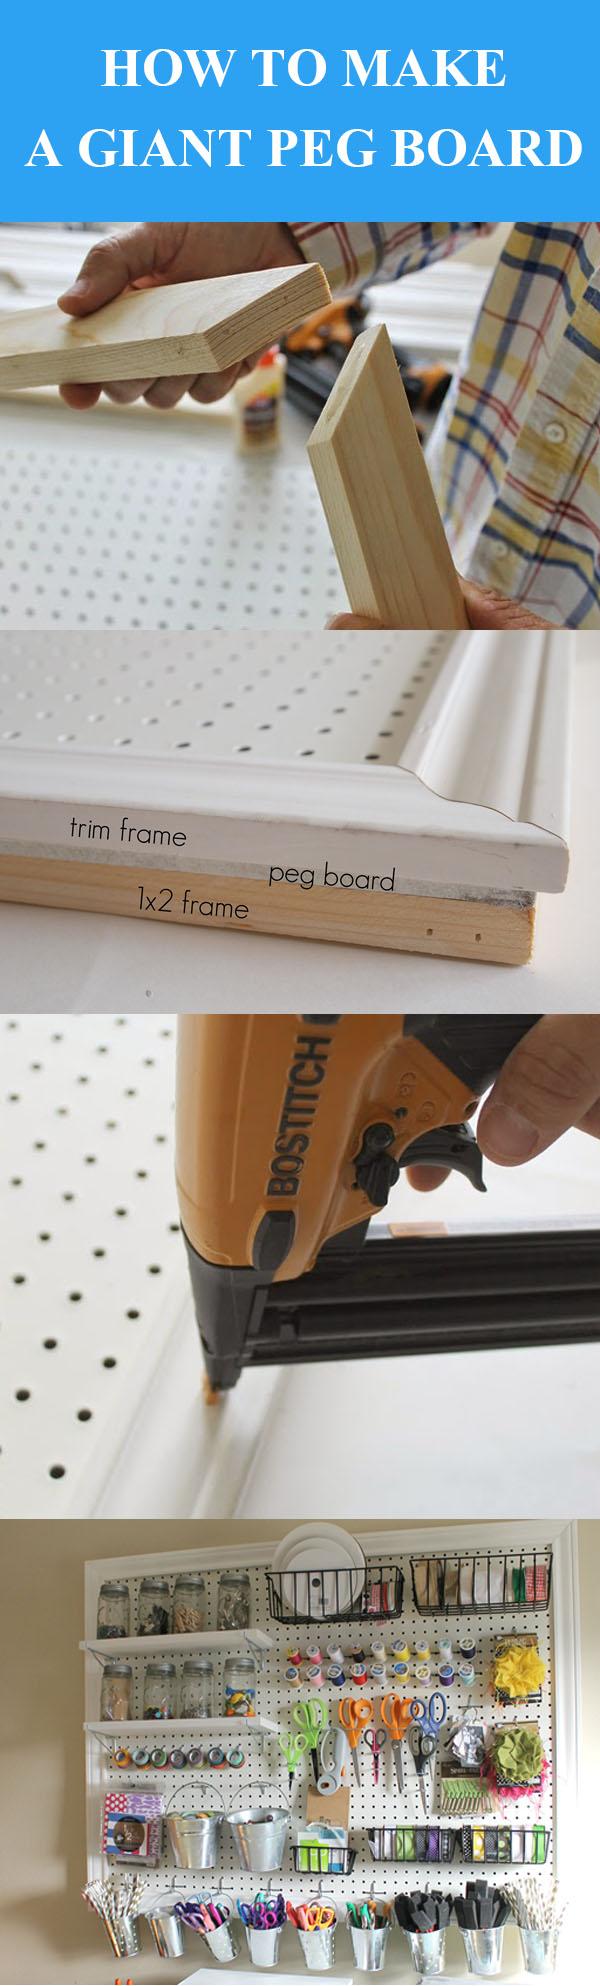 DIY Giant Peg Board